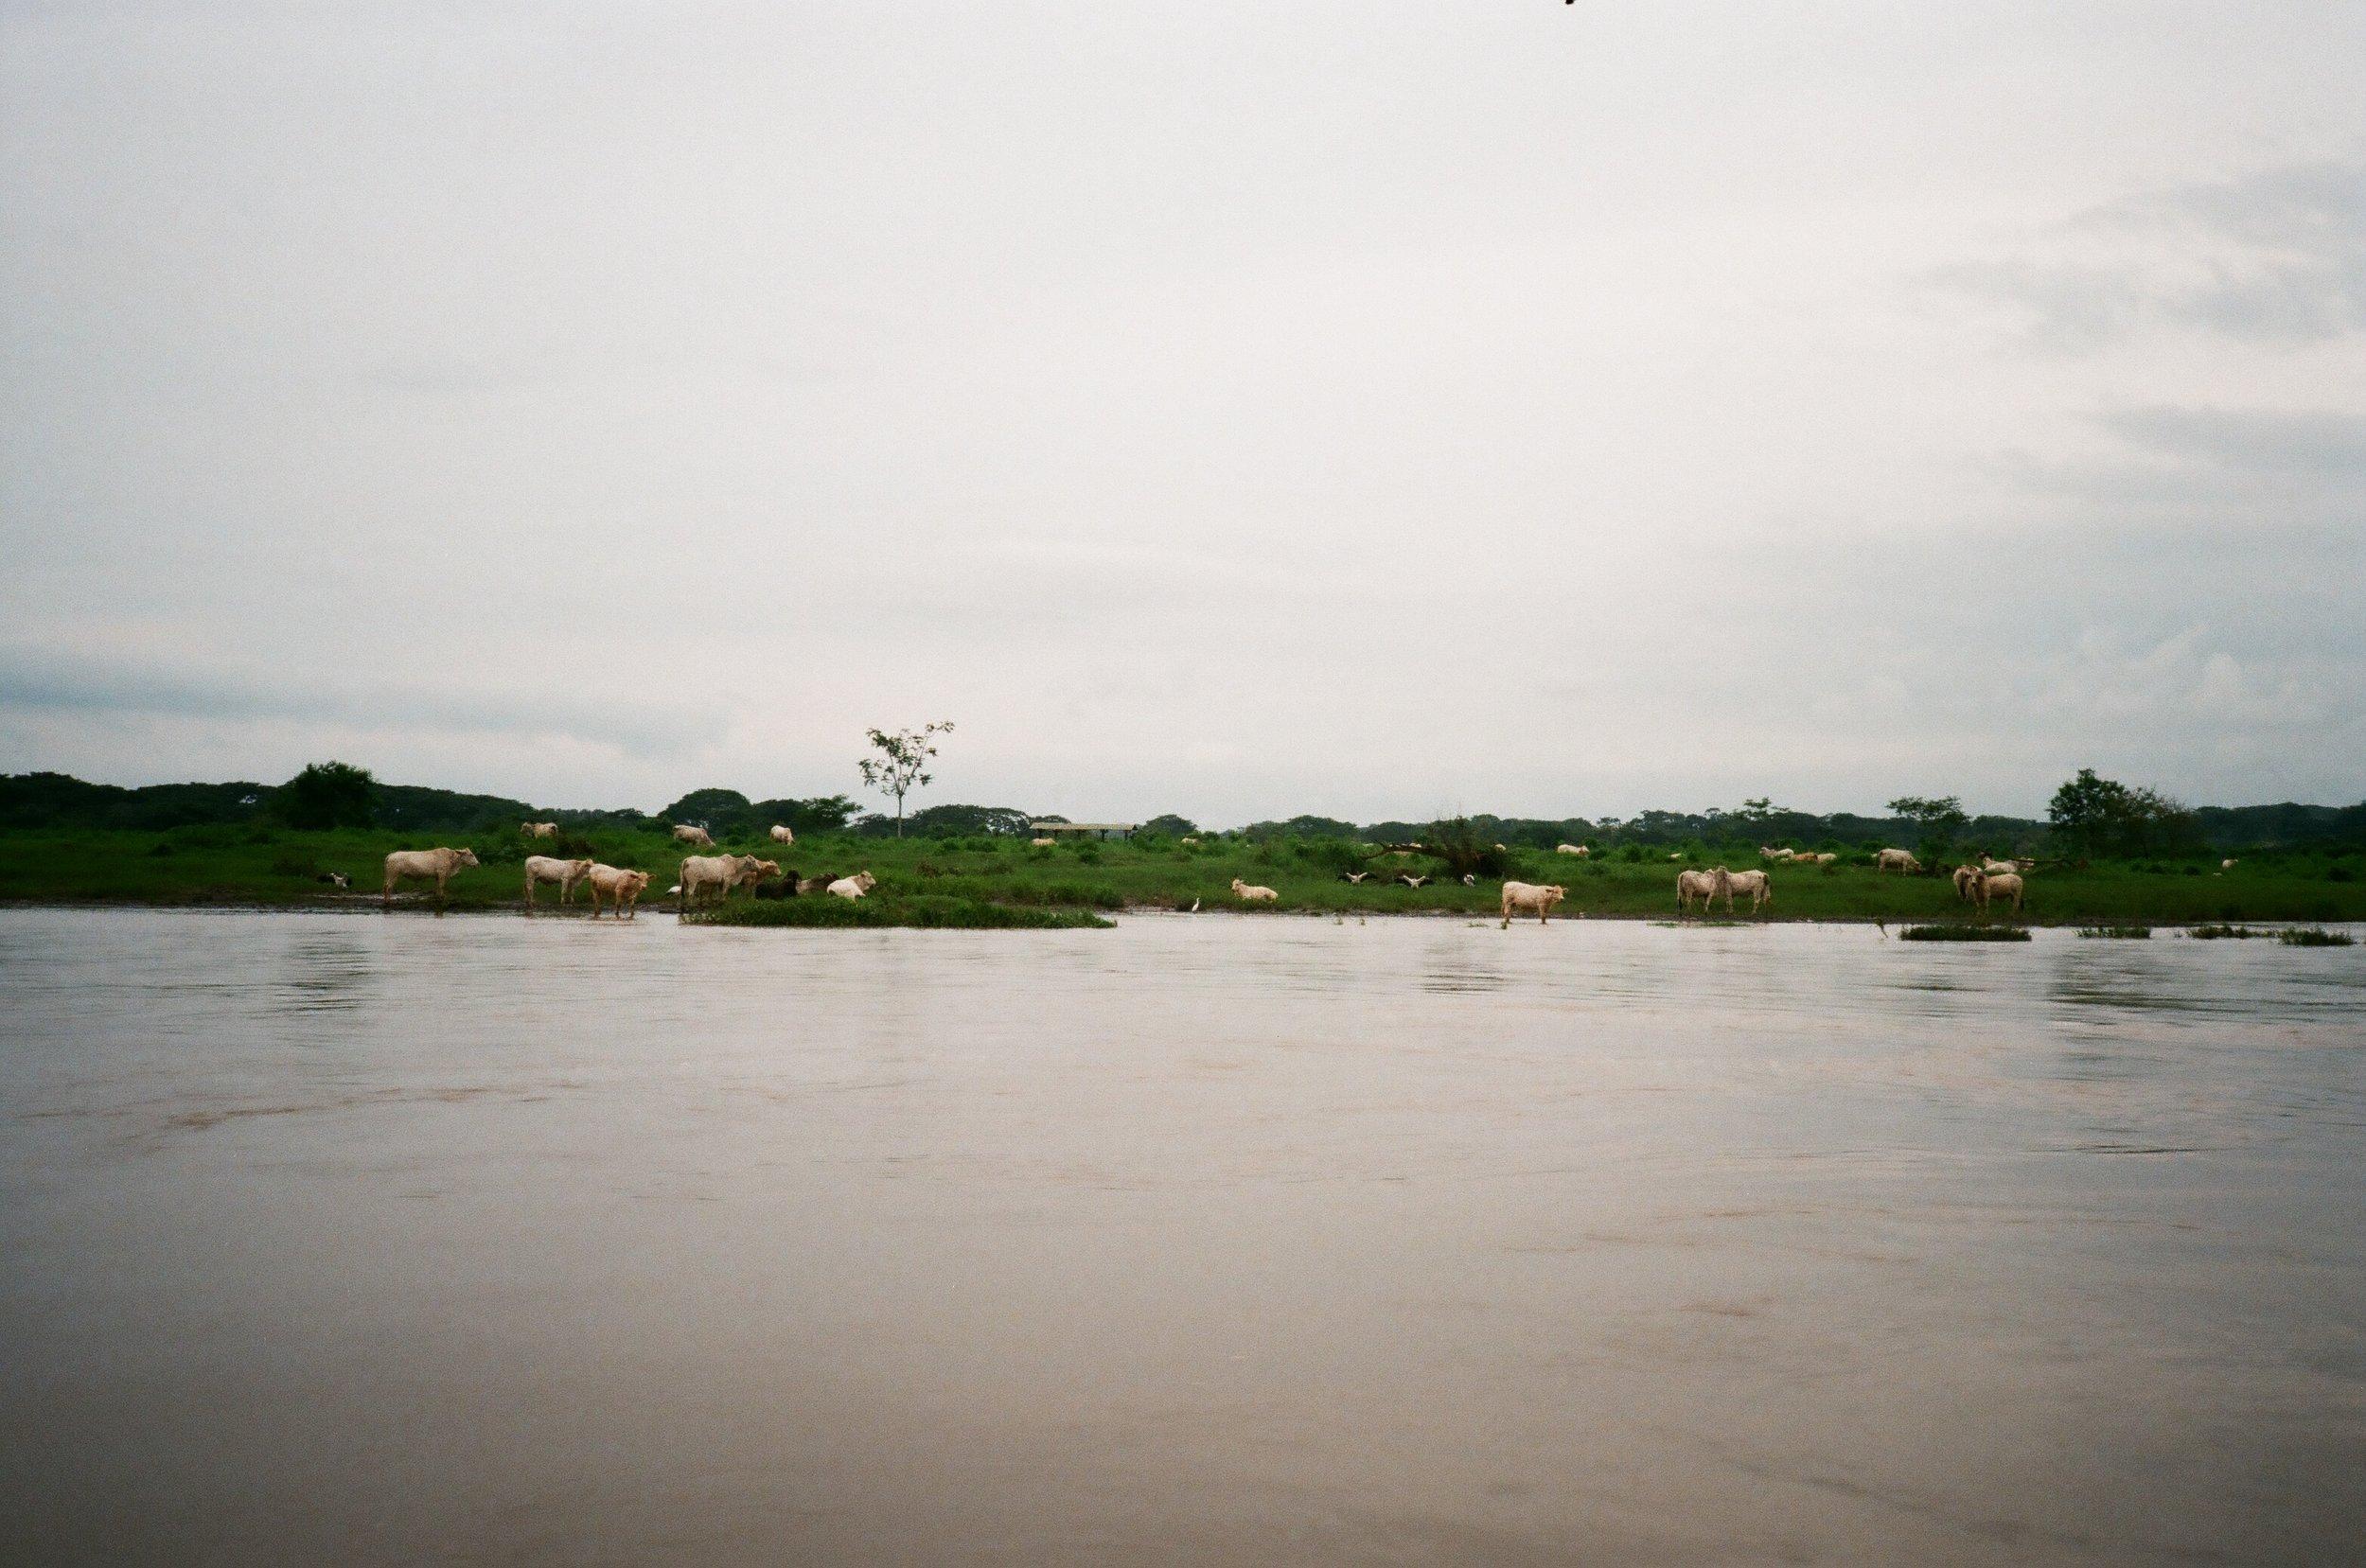 River Tarcoles, Puntarenas Province, Costa Rica